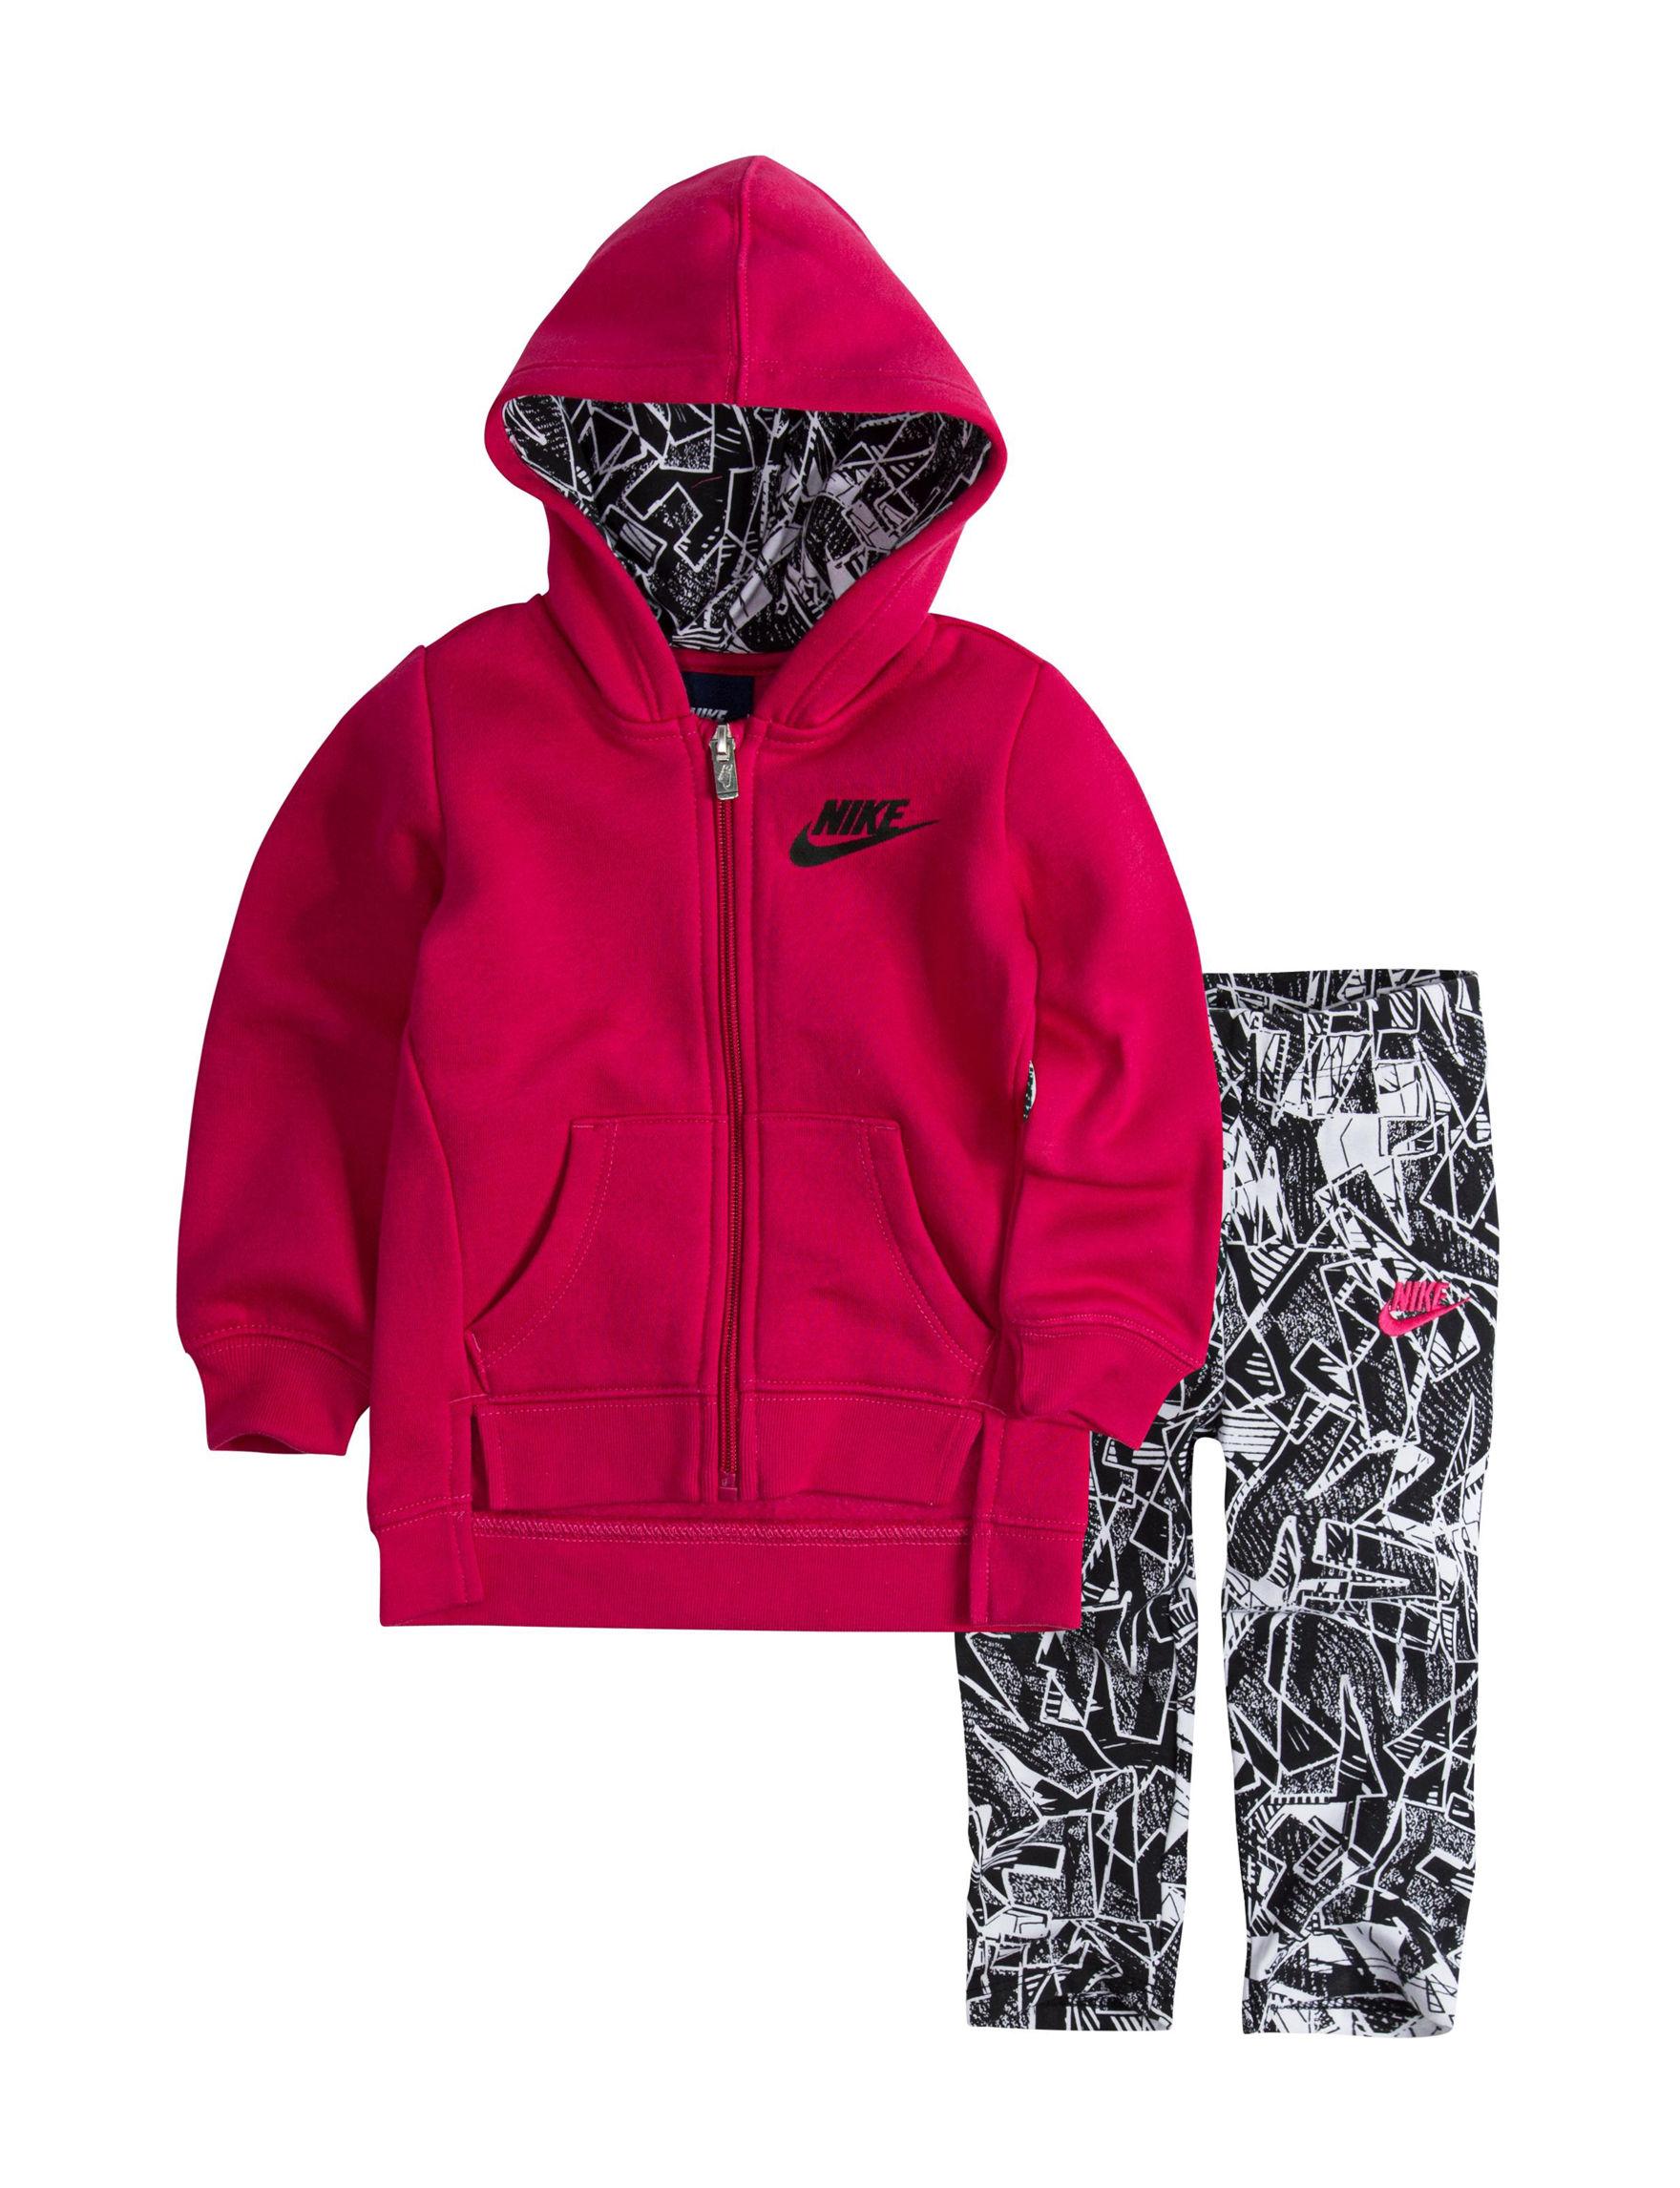 Nike Red / Black Fleece & Soft Shell Jackets